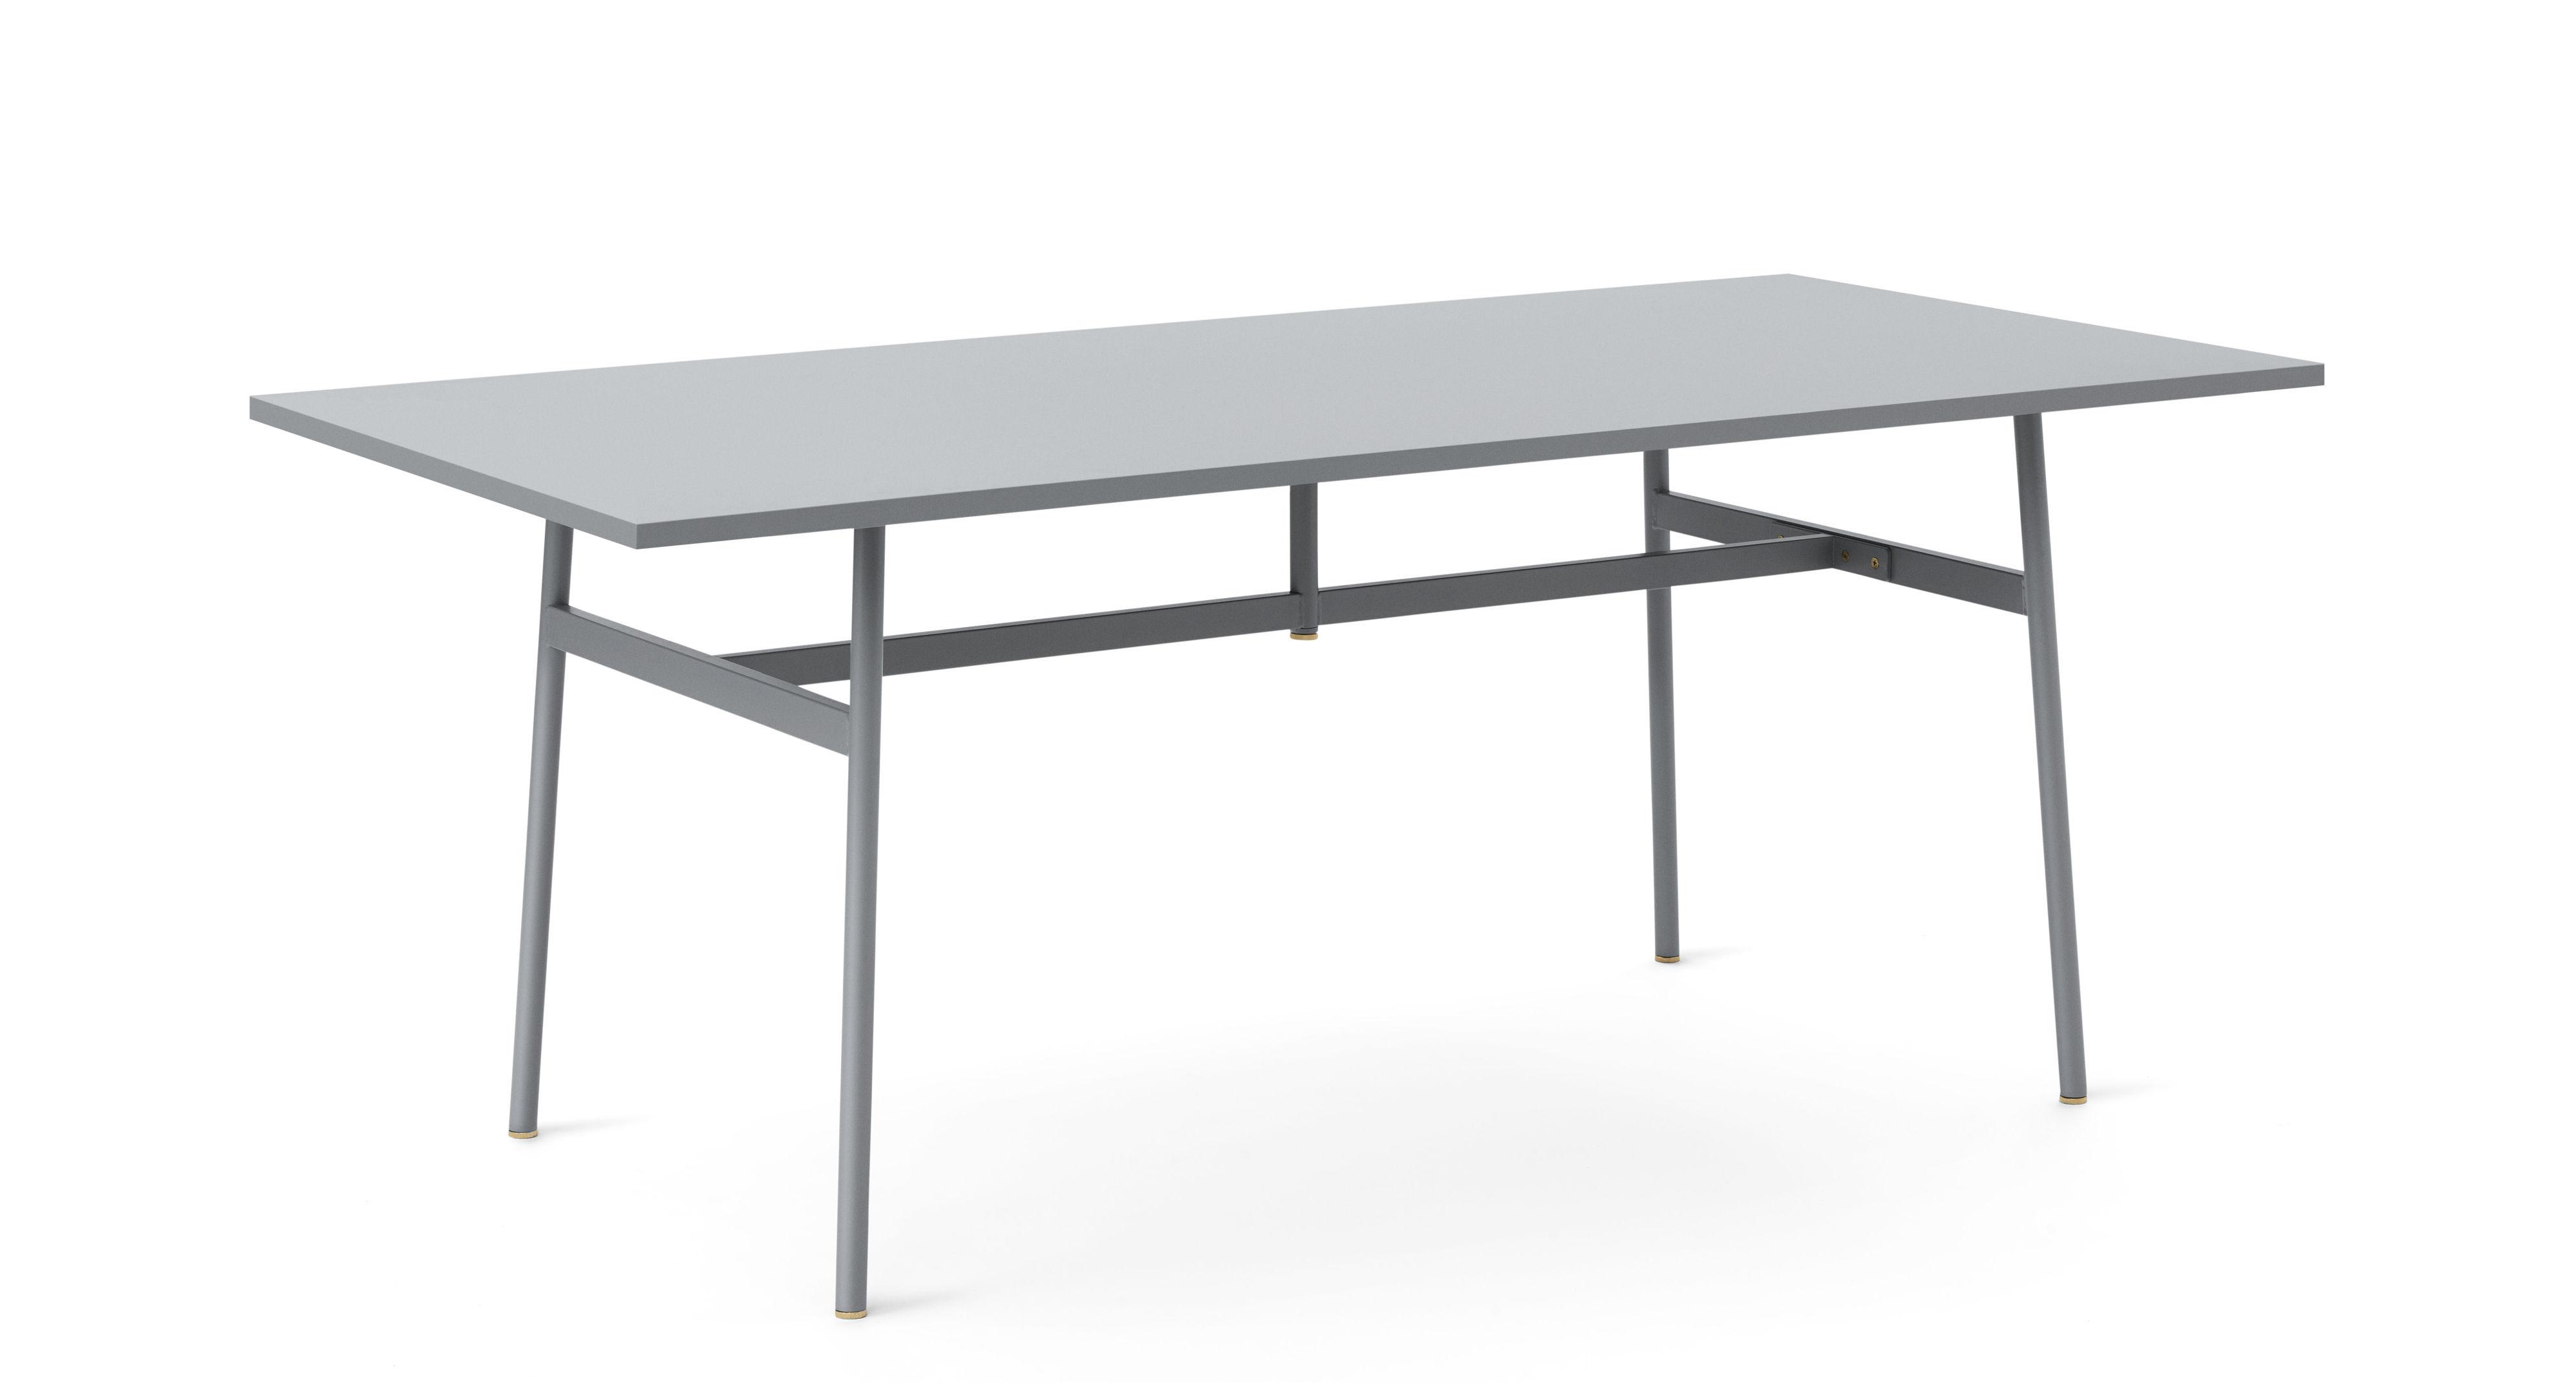 Furniture - Office Furniture - Union Desk - / 180 x 90 cm - Fenix laminate by Normann Copenhagen - Grey - Steel, Stratifié Fenix